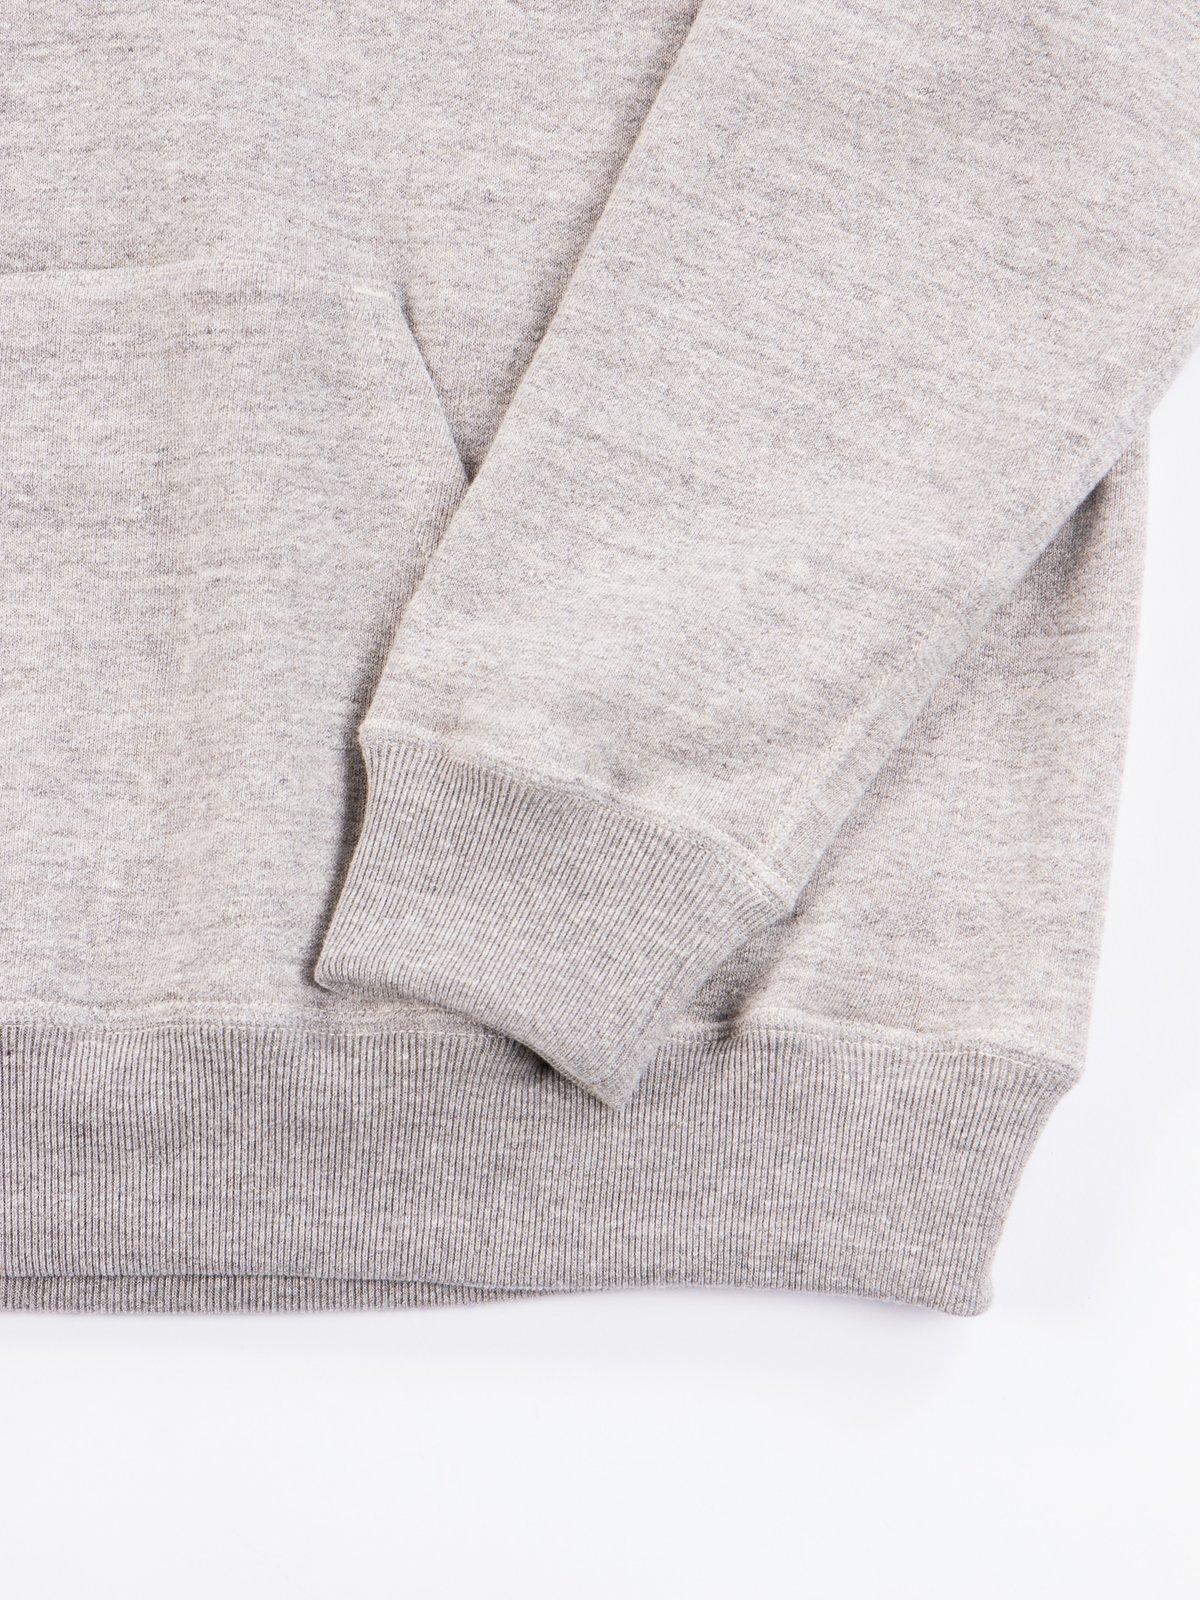 Heather Grey Hooded Sweat - Image 5